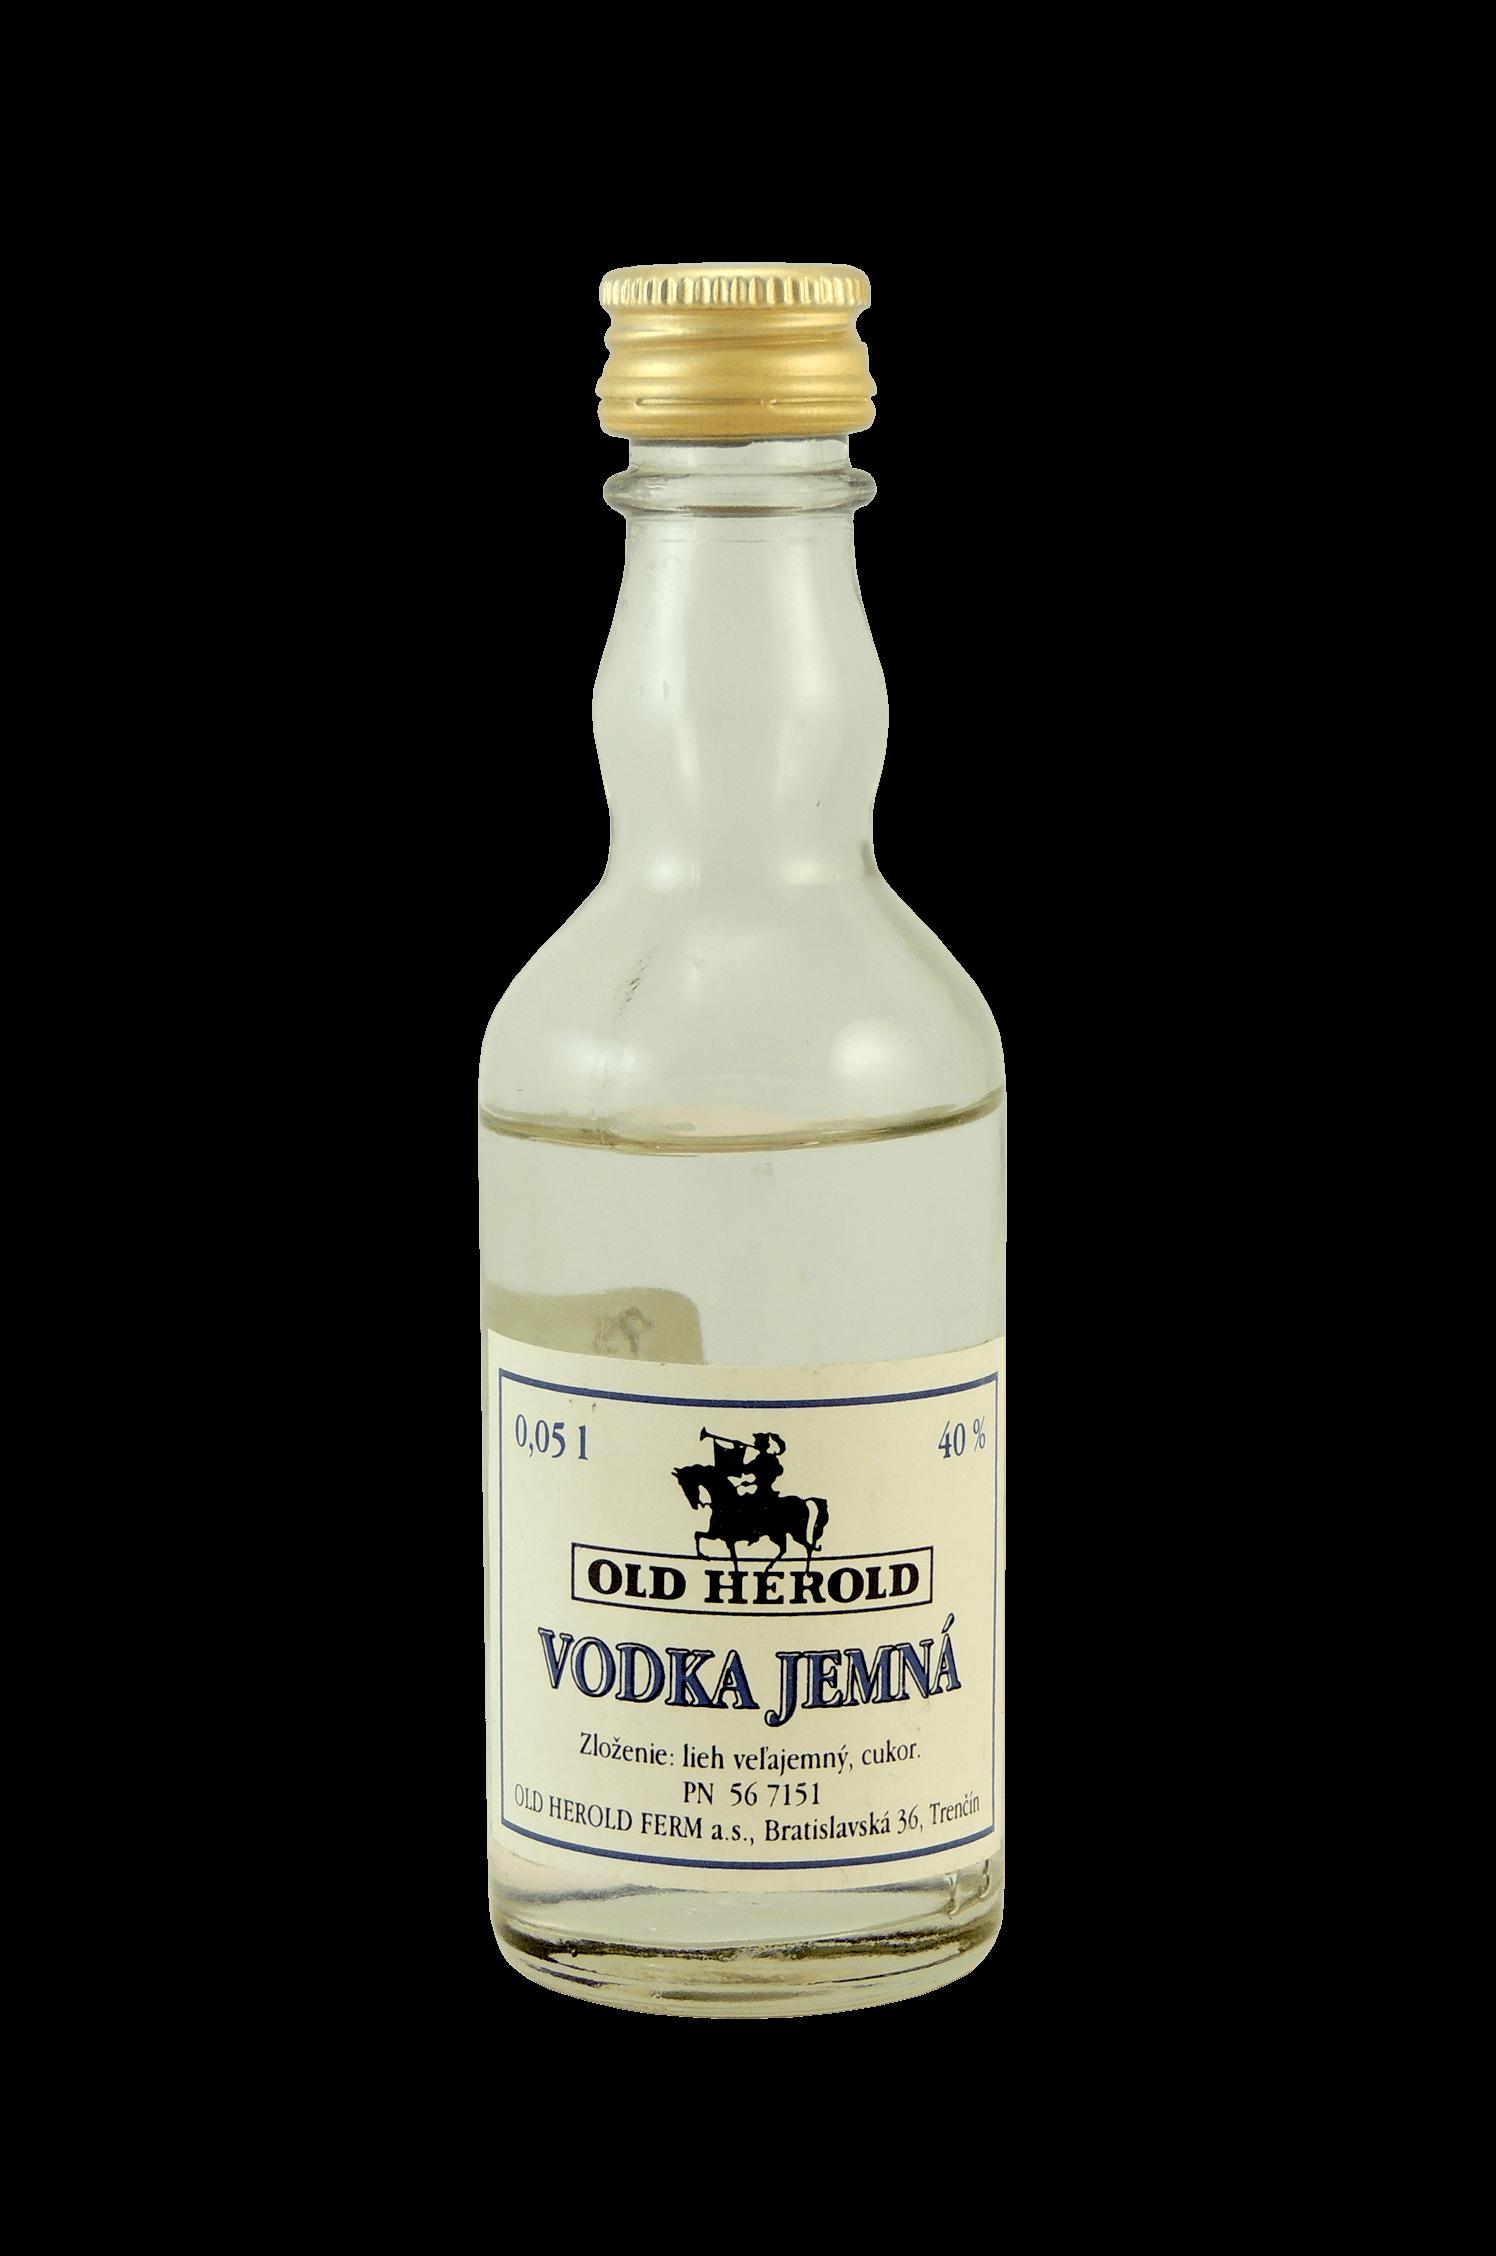 Old Herold Vodka Jemná